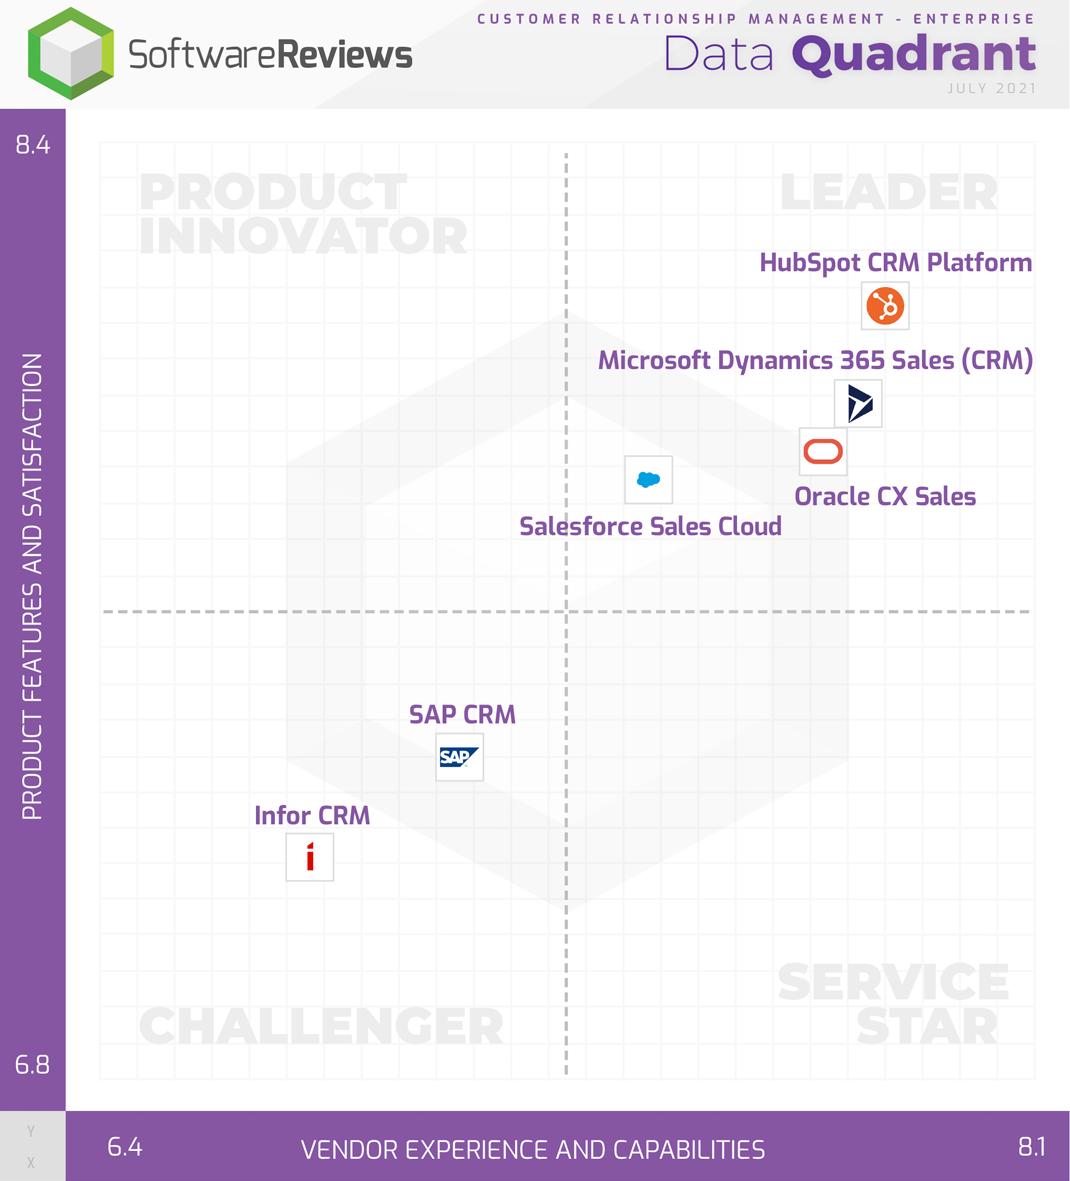 Customer Relationship Management - Enterprise Data Quadrant